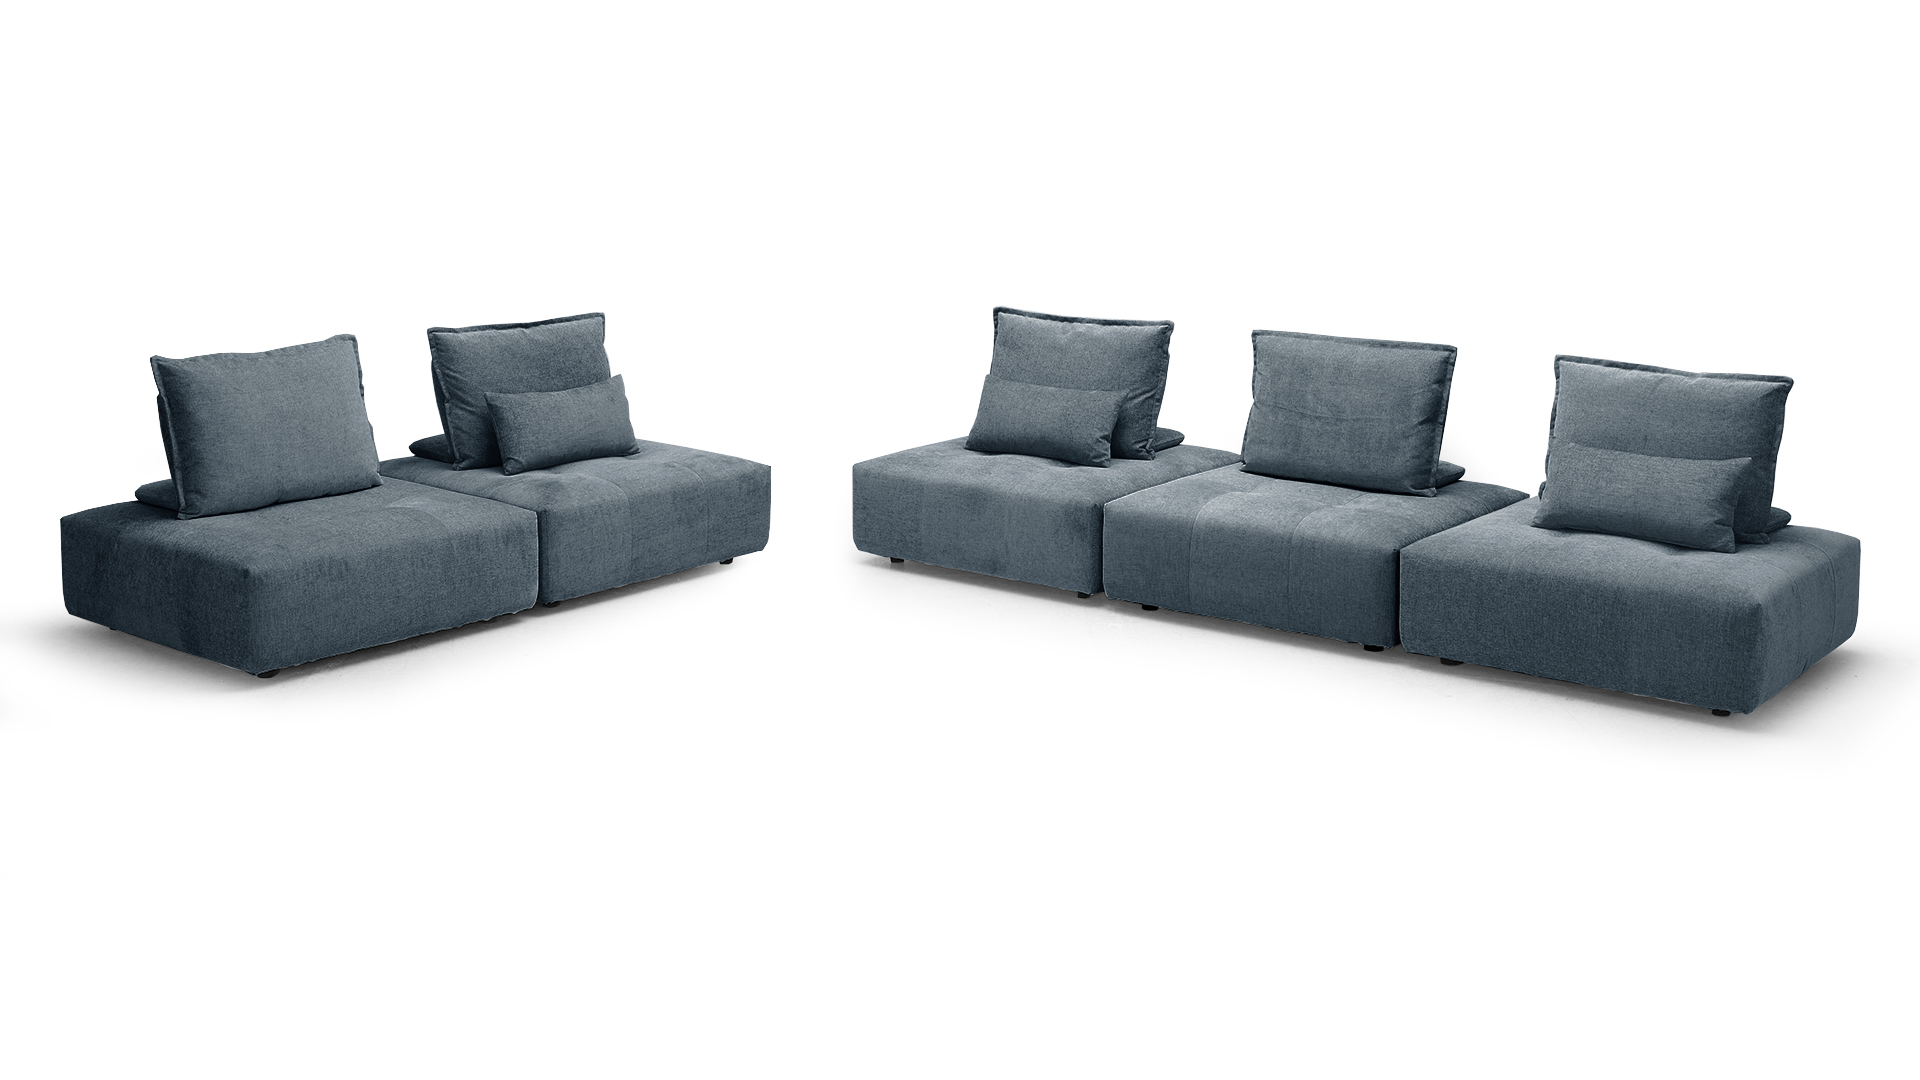 canape 5places separe modulable tissu bleu b599 dossier deplacable larvik mobiliermoss le blog. Black Bedroom Furniture Sets. Home Design Ideas